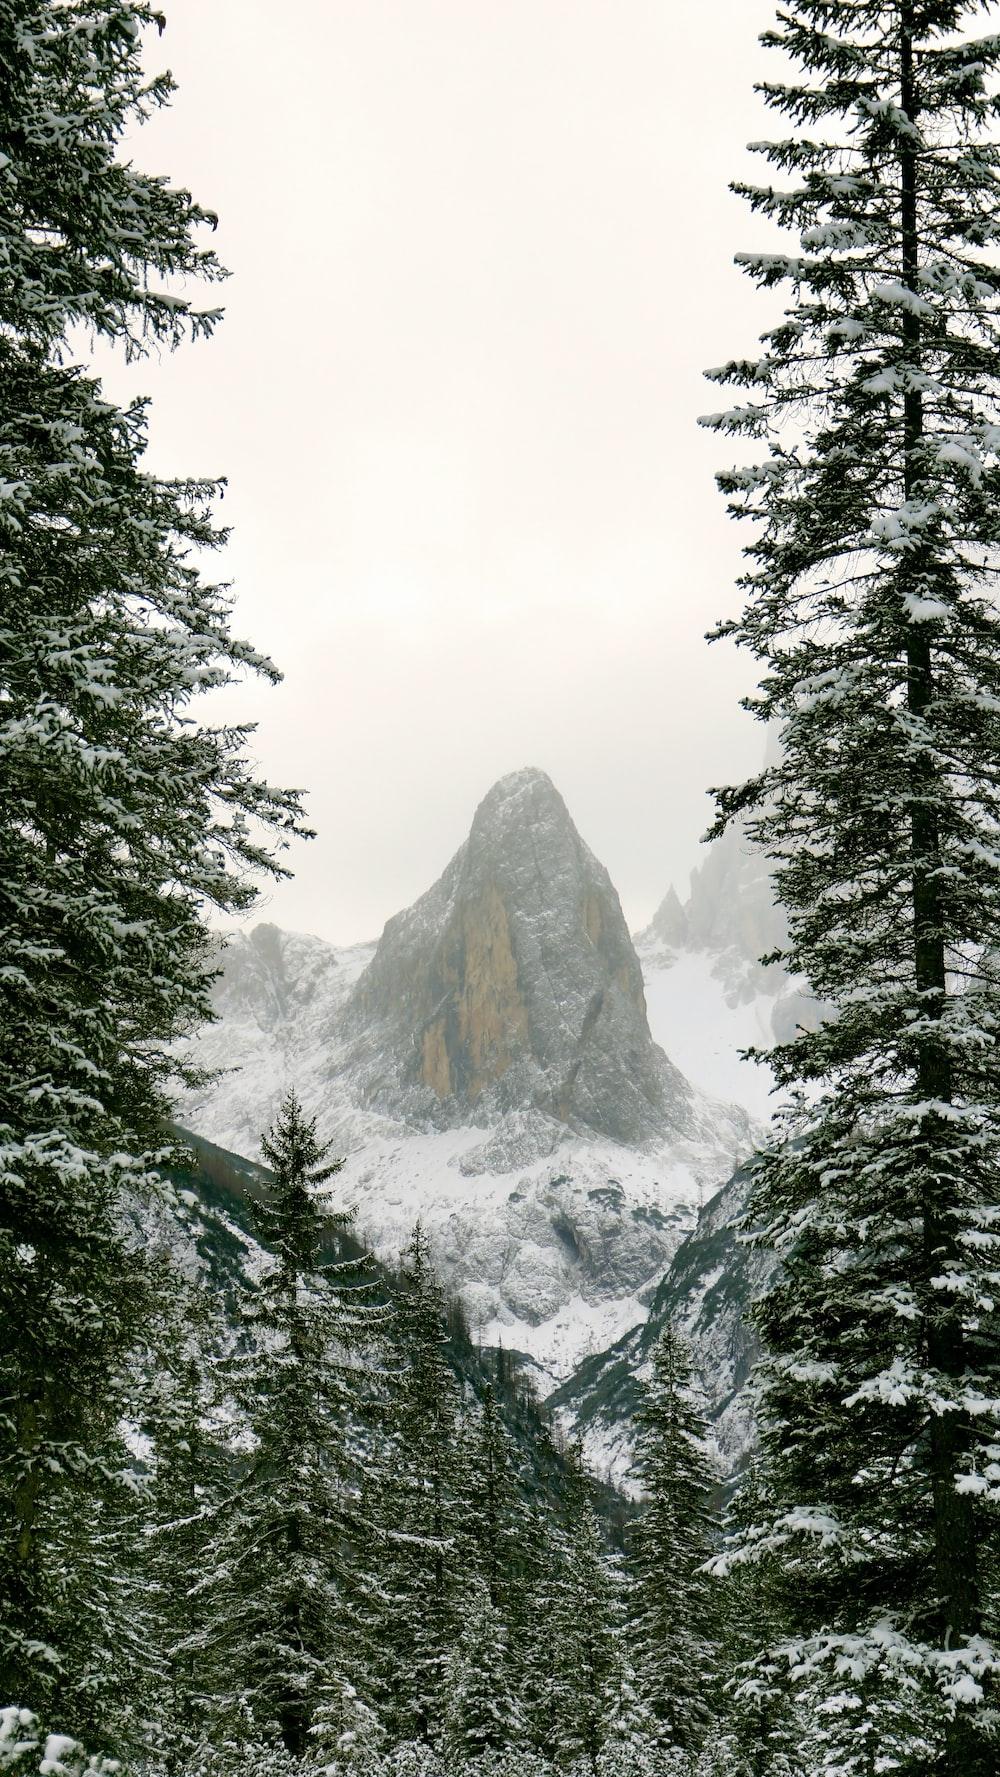 rock hill view between green pine trees